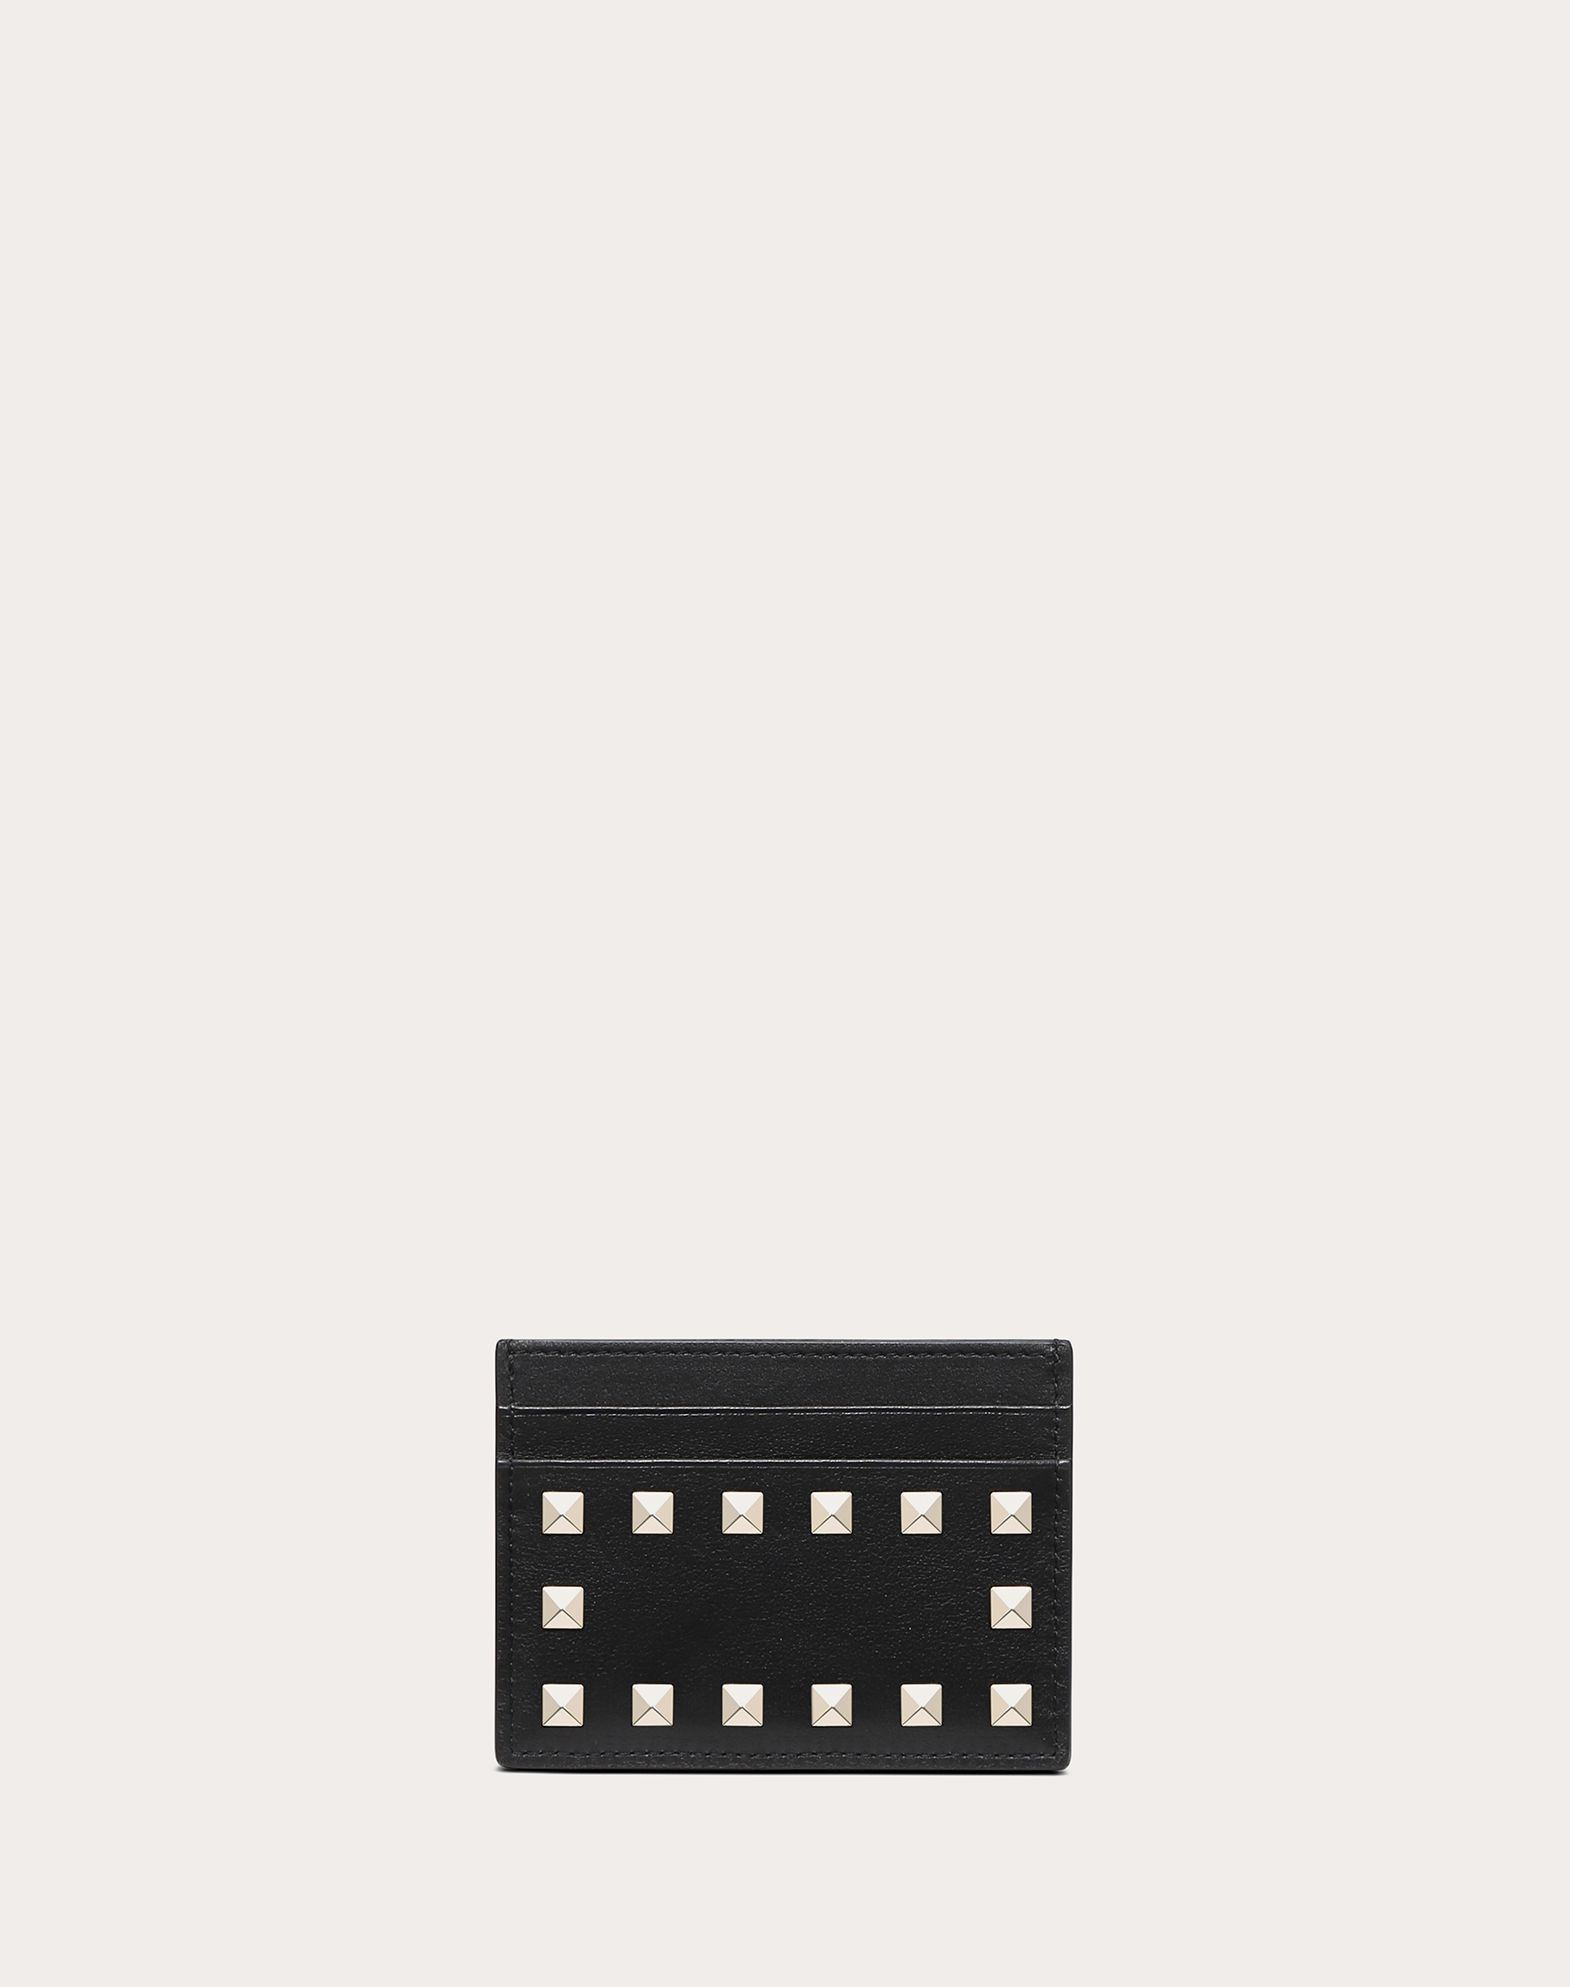 VALENTINO GARAVANI Rockstud Card Holder COIN PURSES & CARD CASES D f